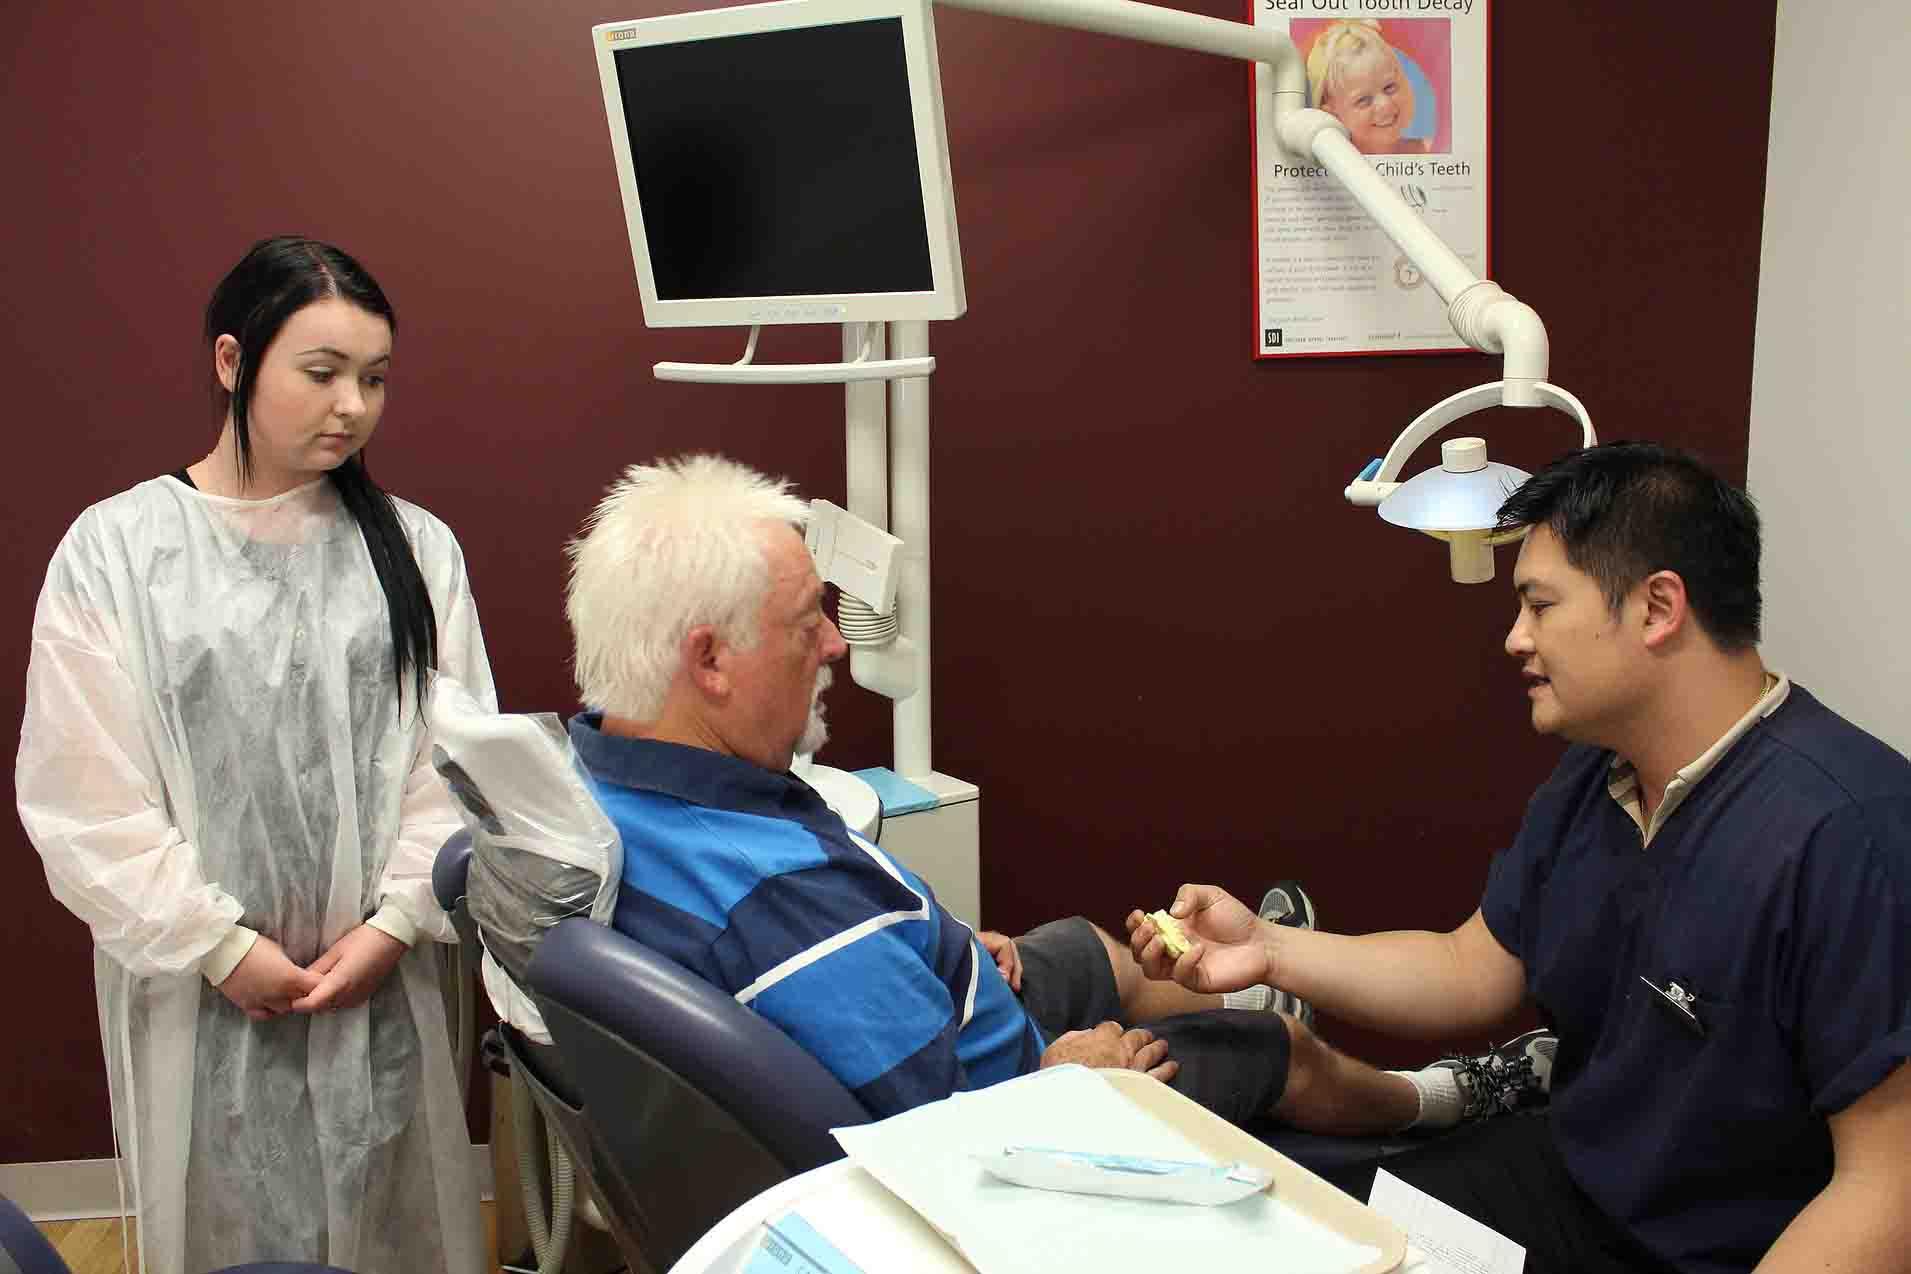 kellyville dental services employee